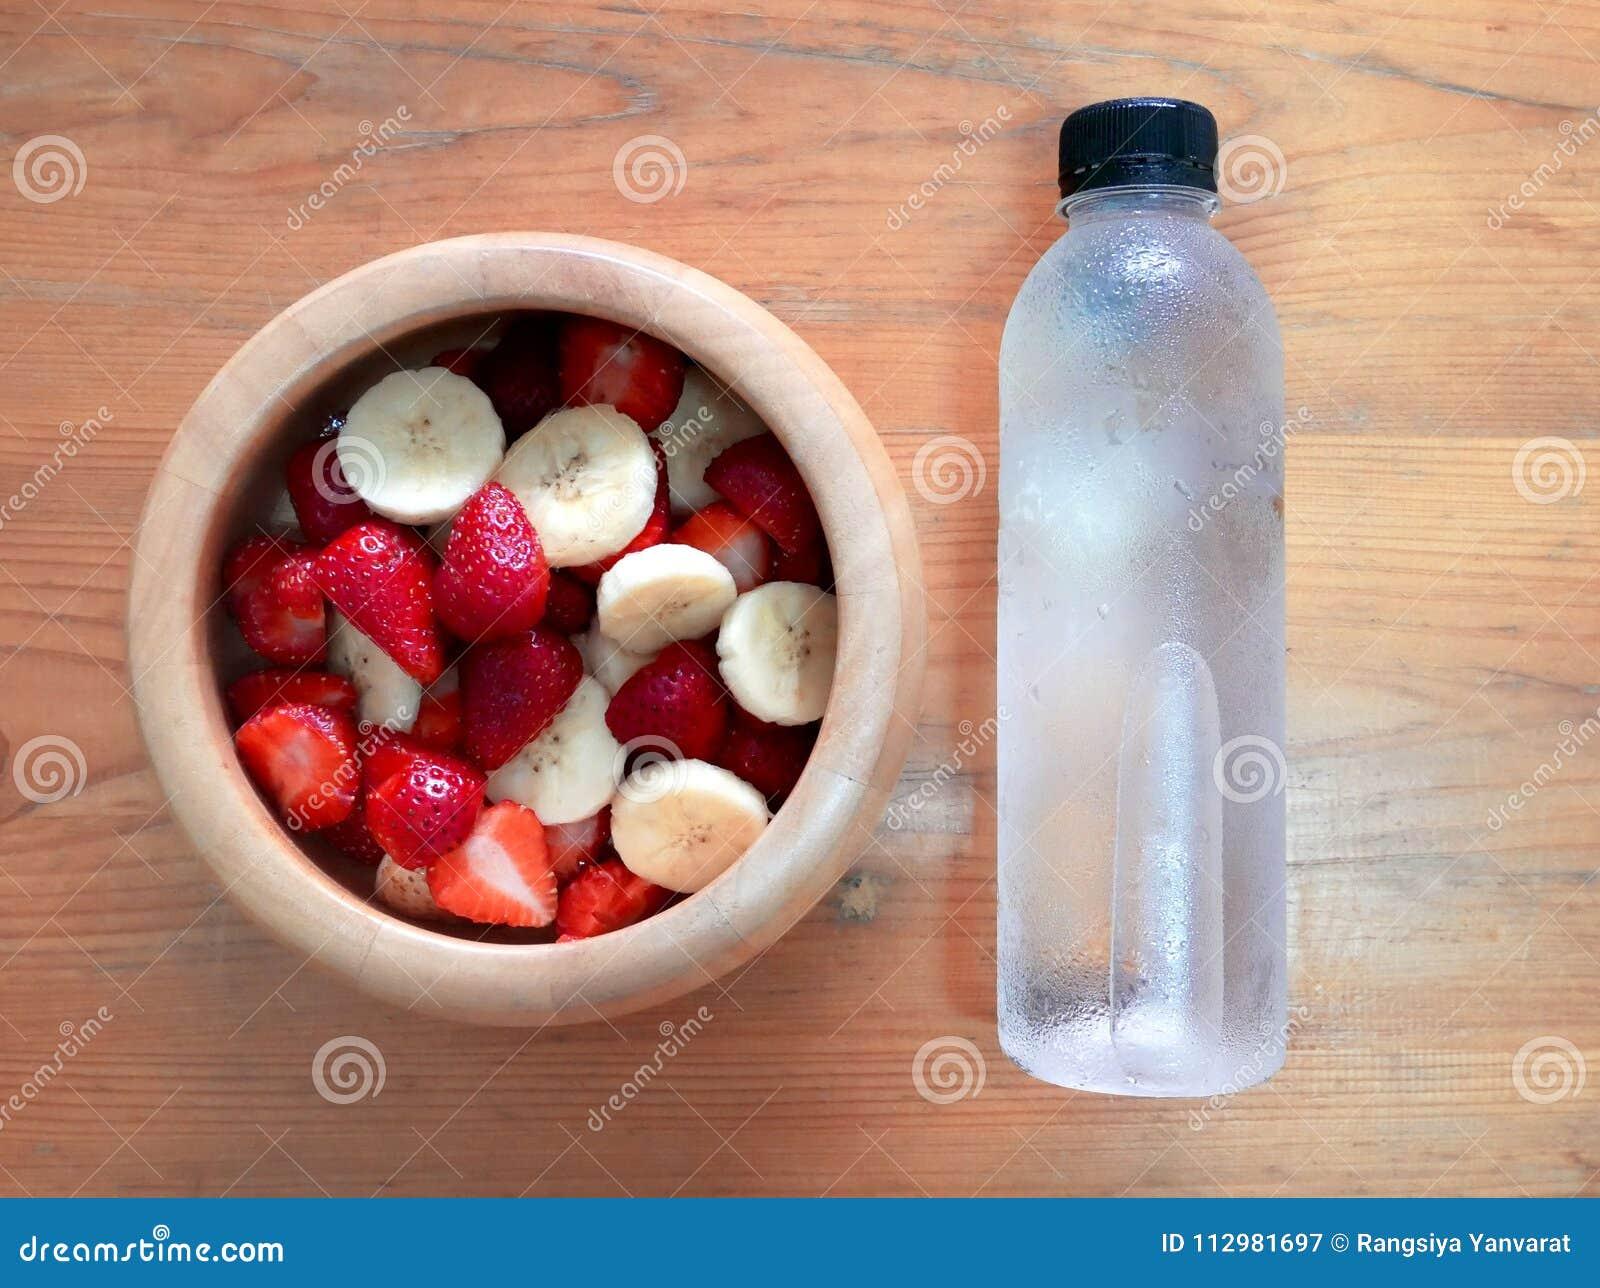 Strawberry and banana healthy eating.